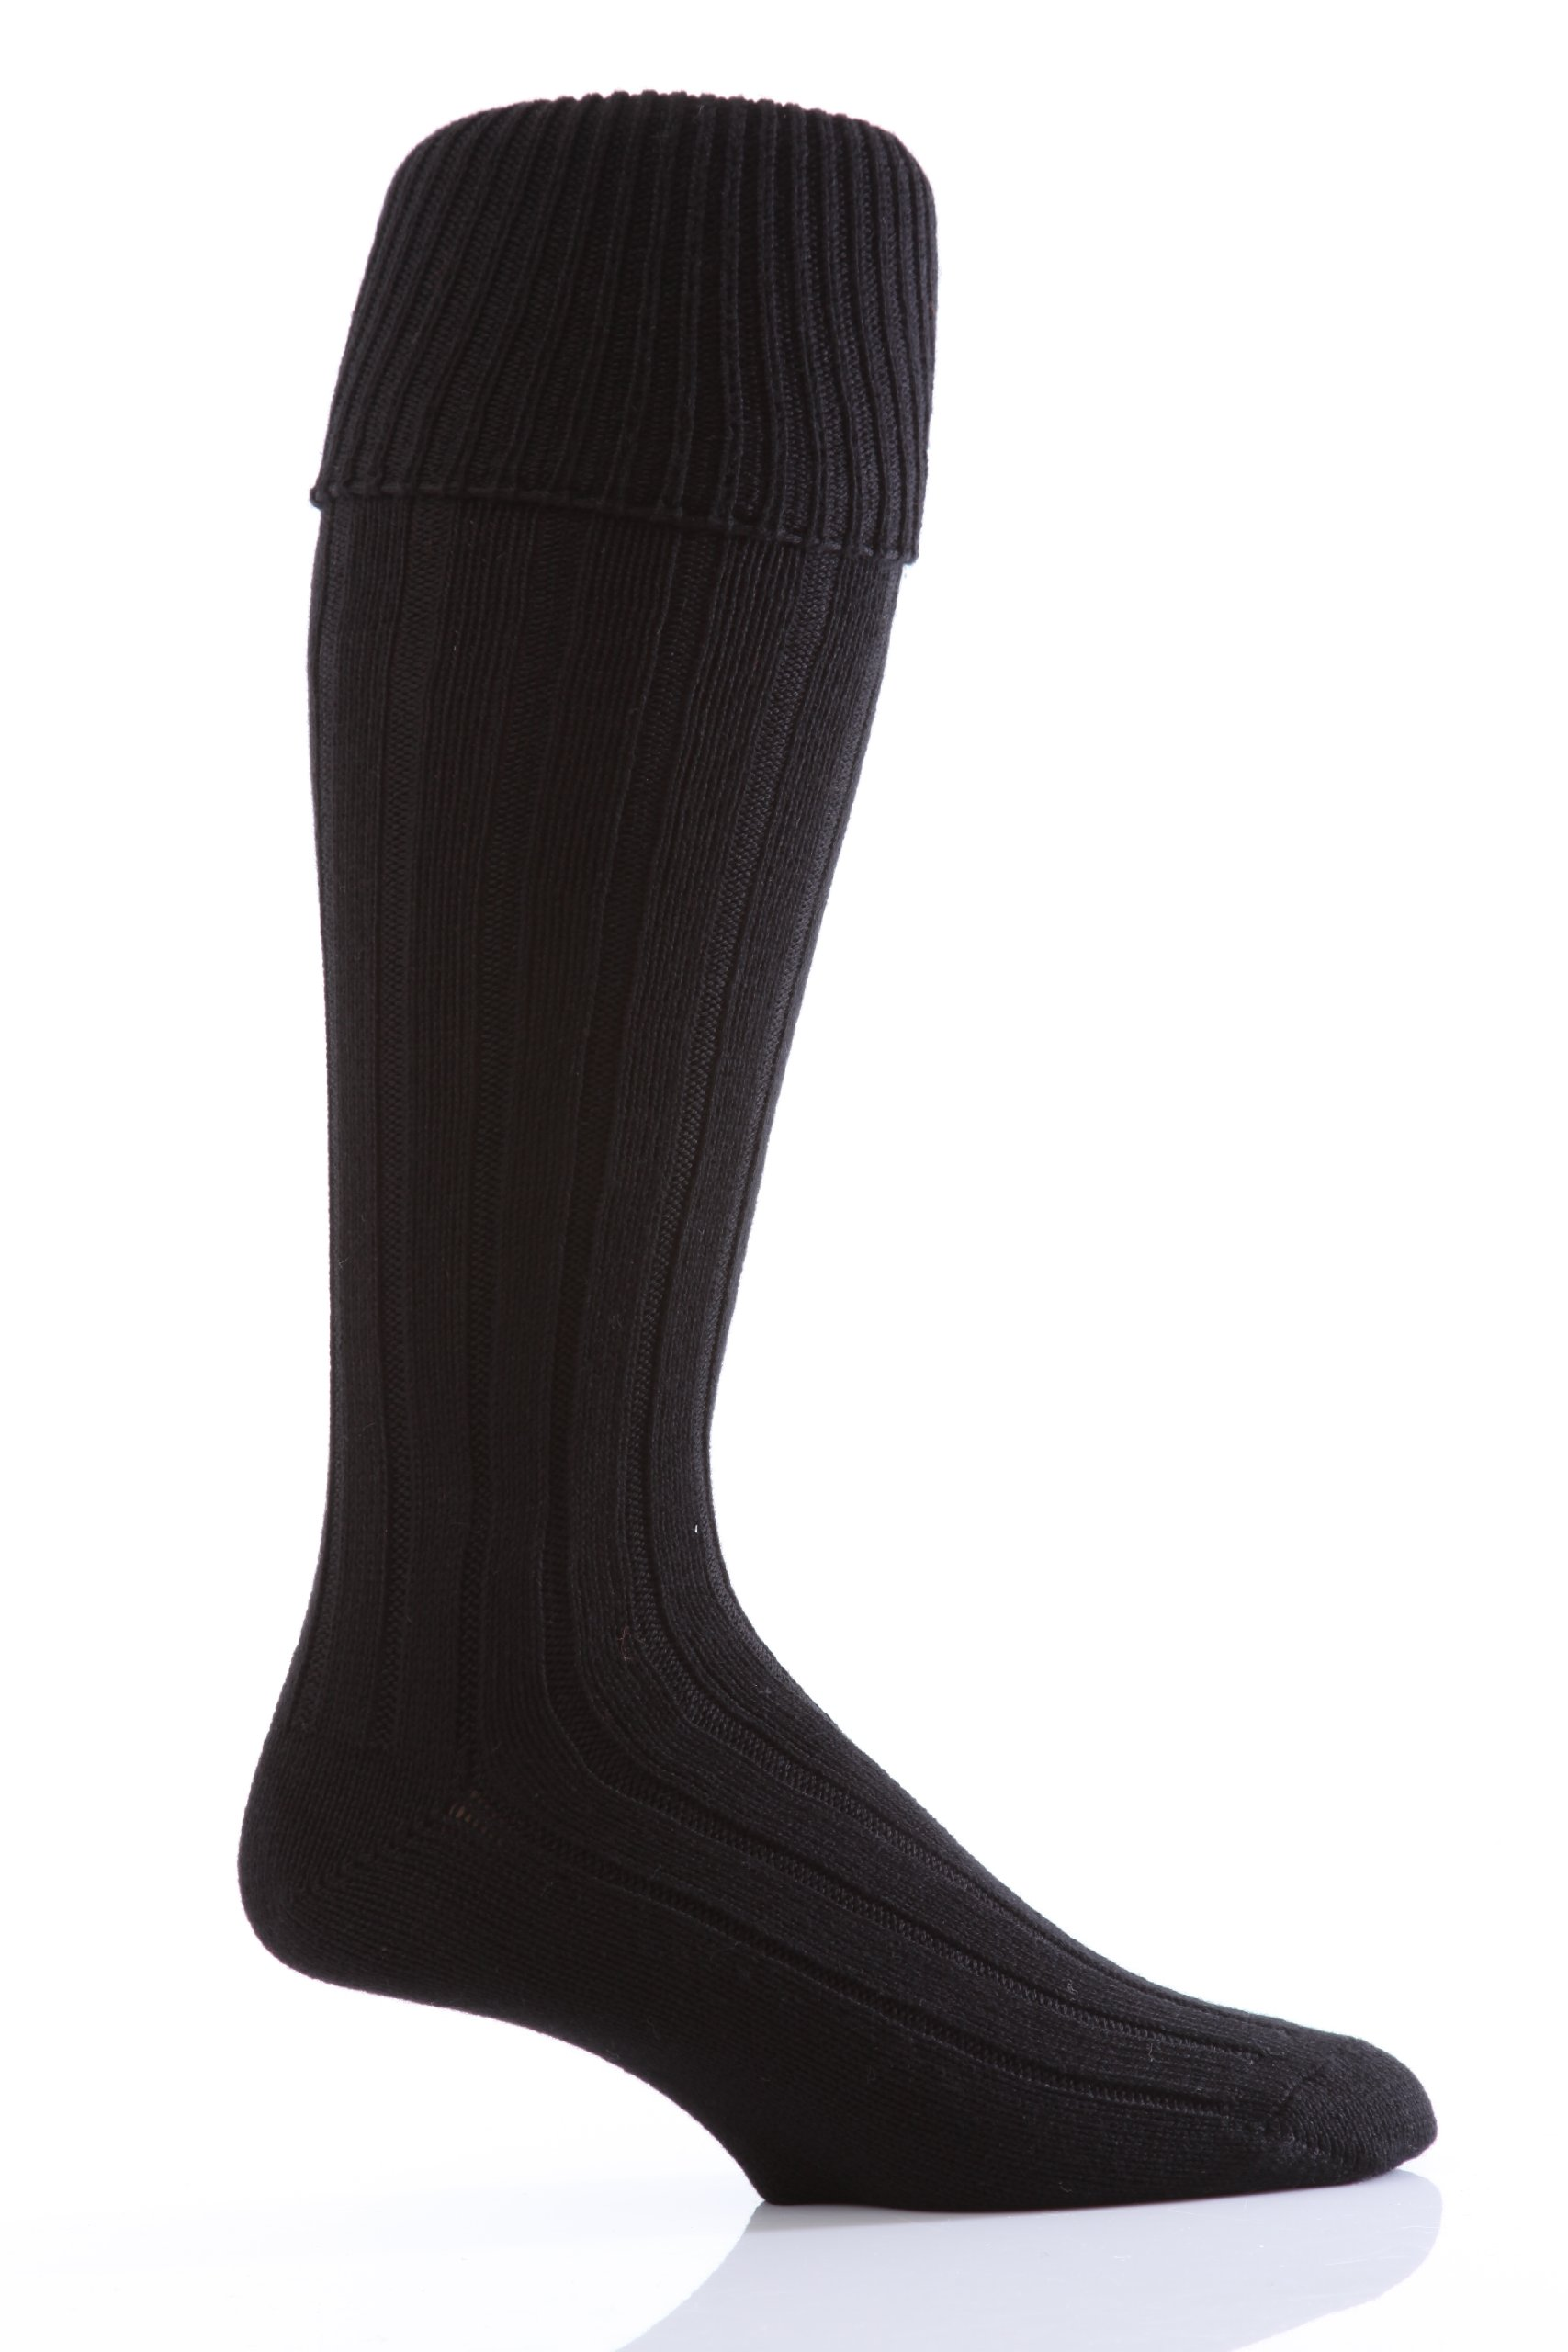 Glenmuir Men's 1 Pair Birkdale Golf Wool Knee High Socks with Turn Over Cuff 8-12 Black by Glenmuir